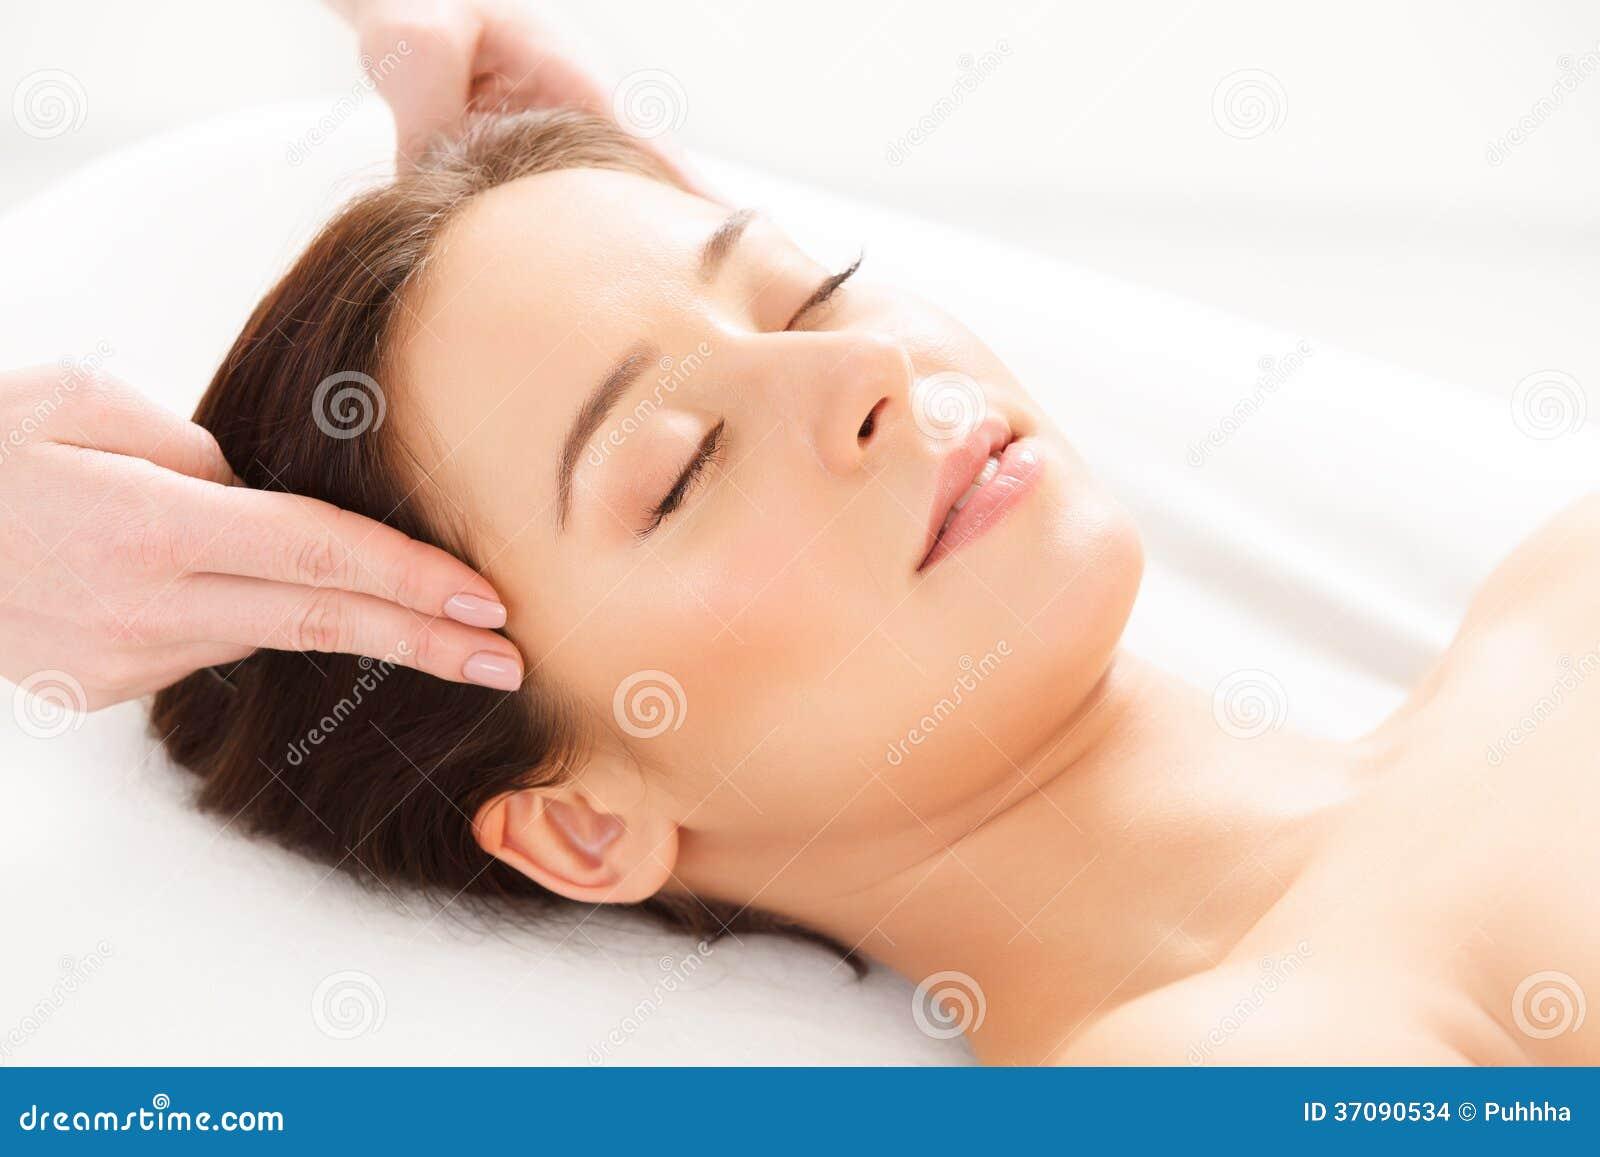 naked woman getting massage